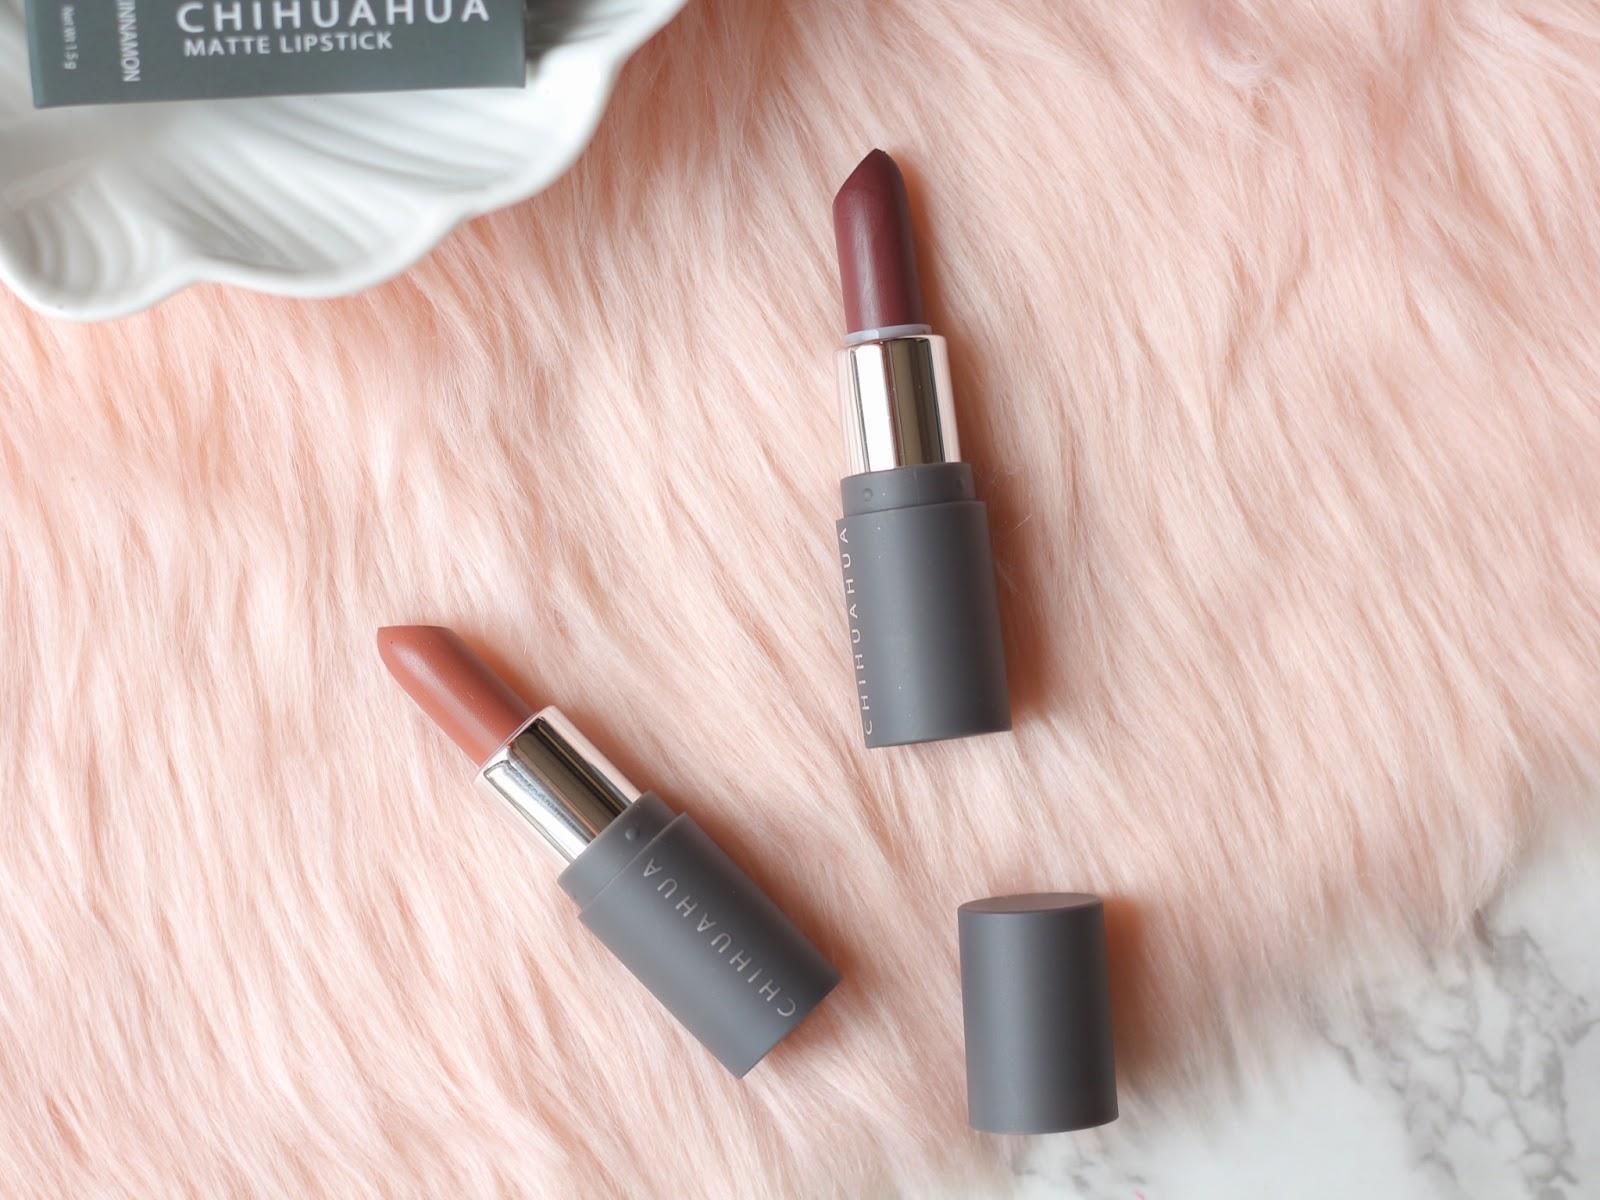 Chihuahua Cosmetics Lipstick Review Matte Cinnamon Creme Coco Swatch